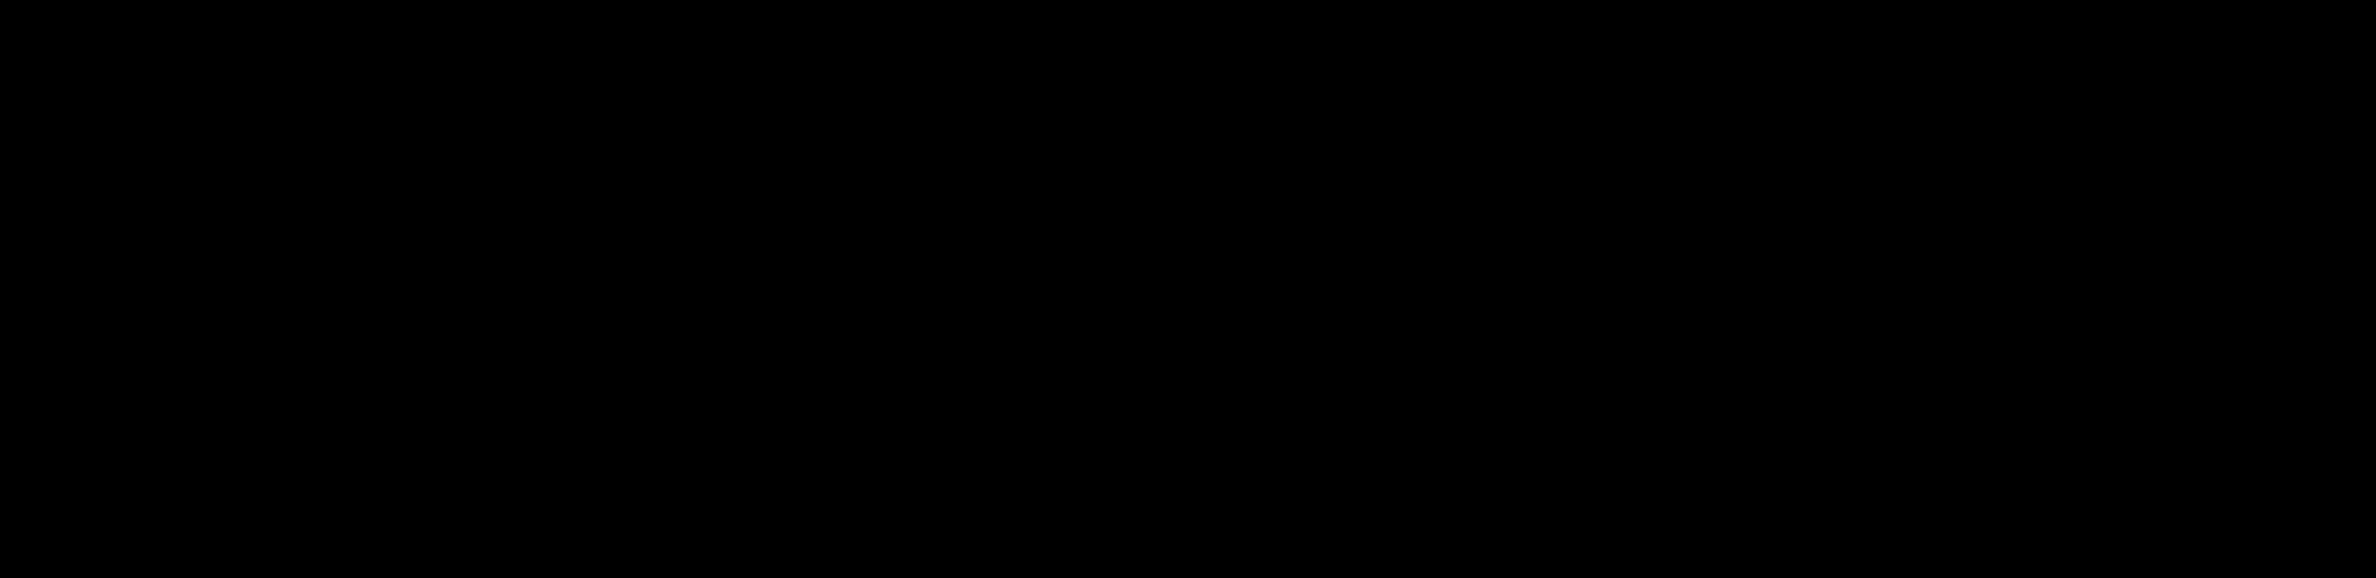 logo horizontal black large